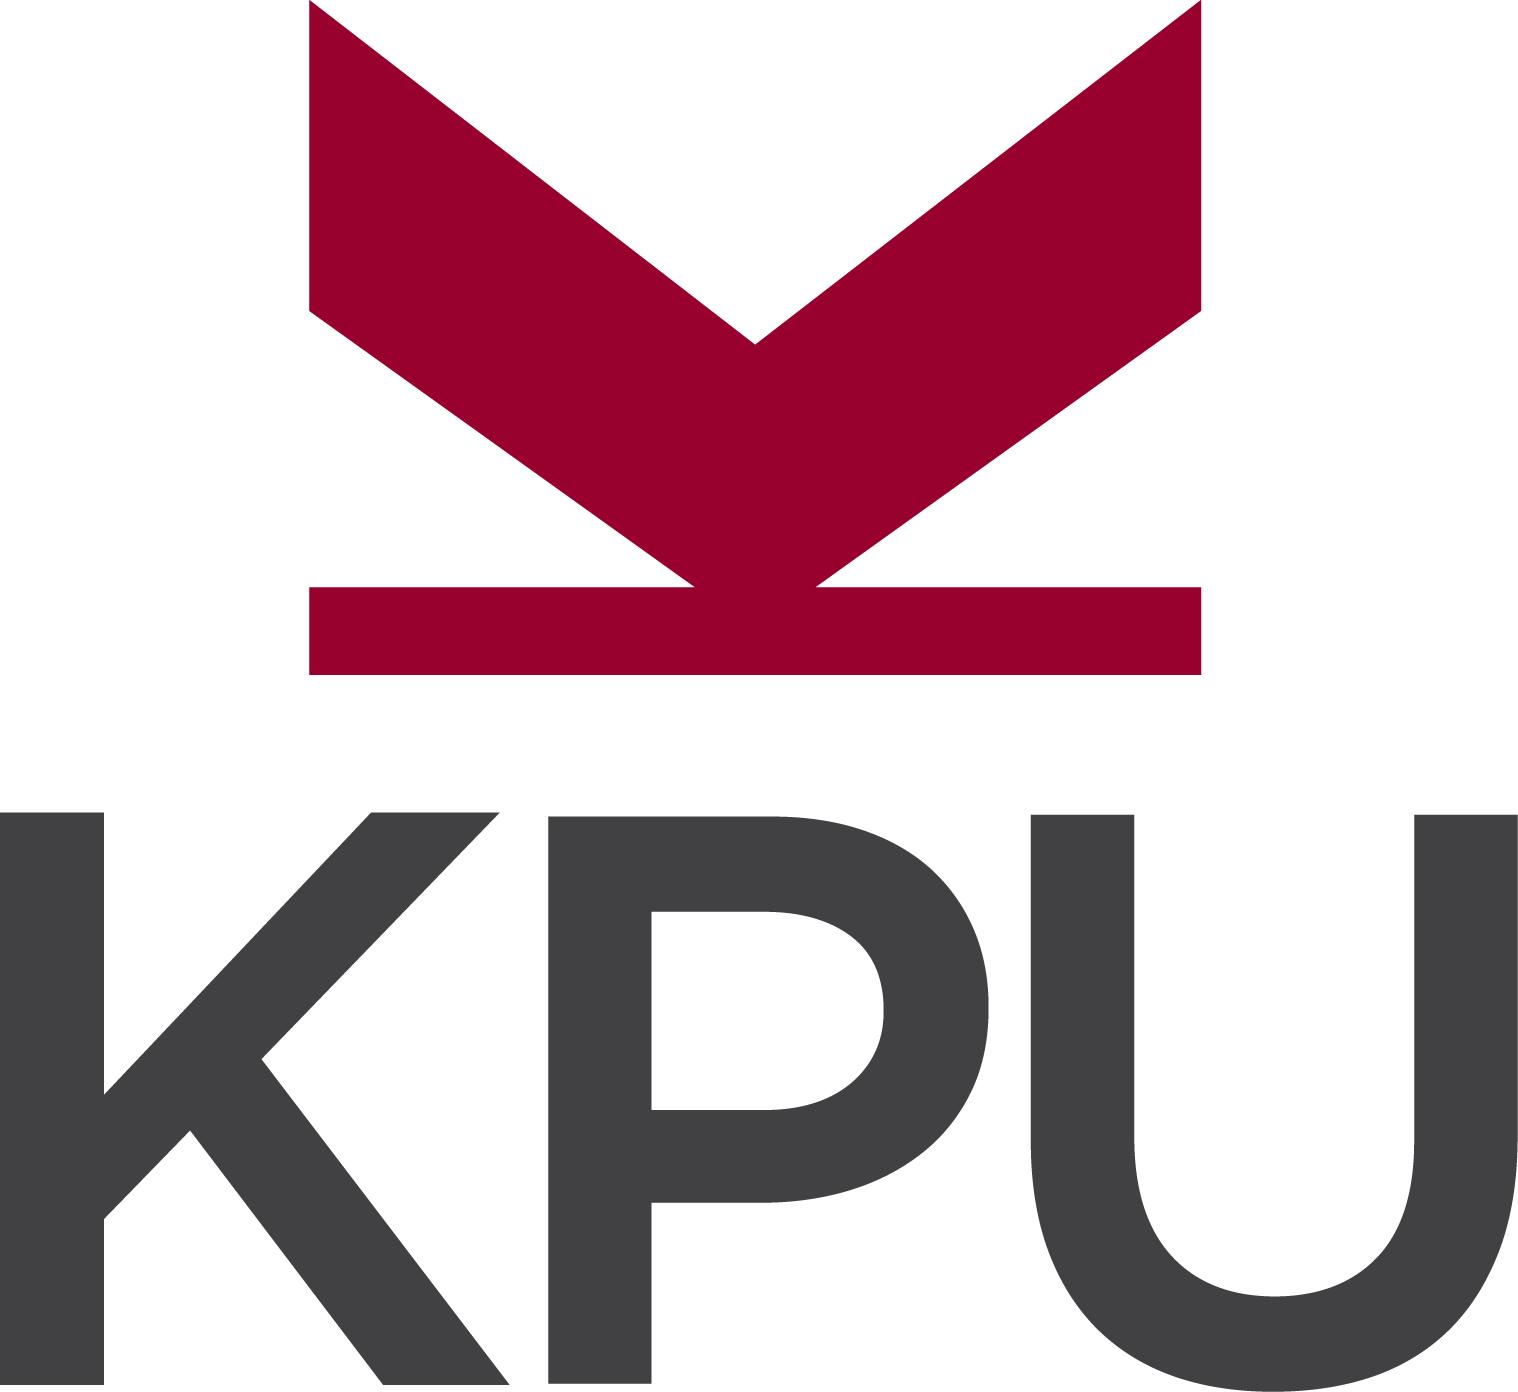 kpu_logo21837